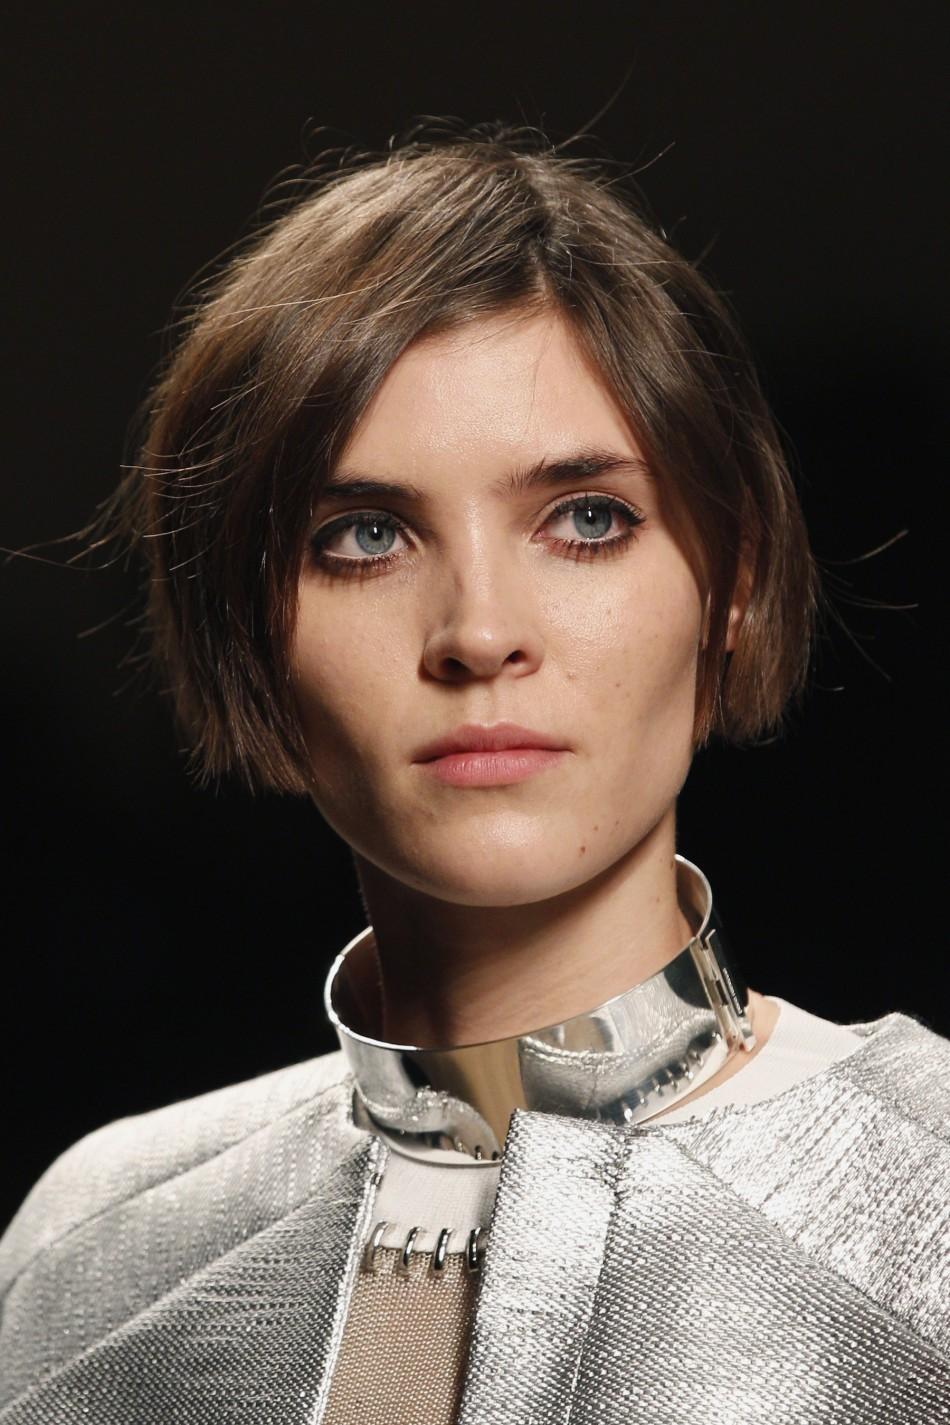 Paris Fashion Week: Manish Aroras' Creation (PHOTOS)